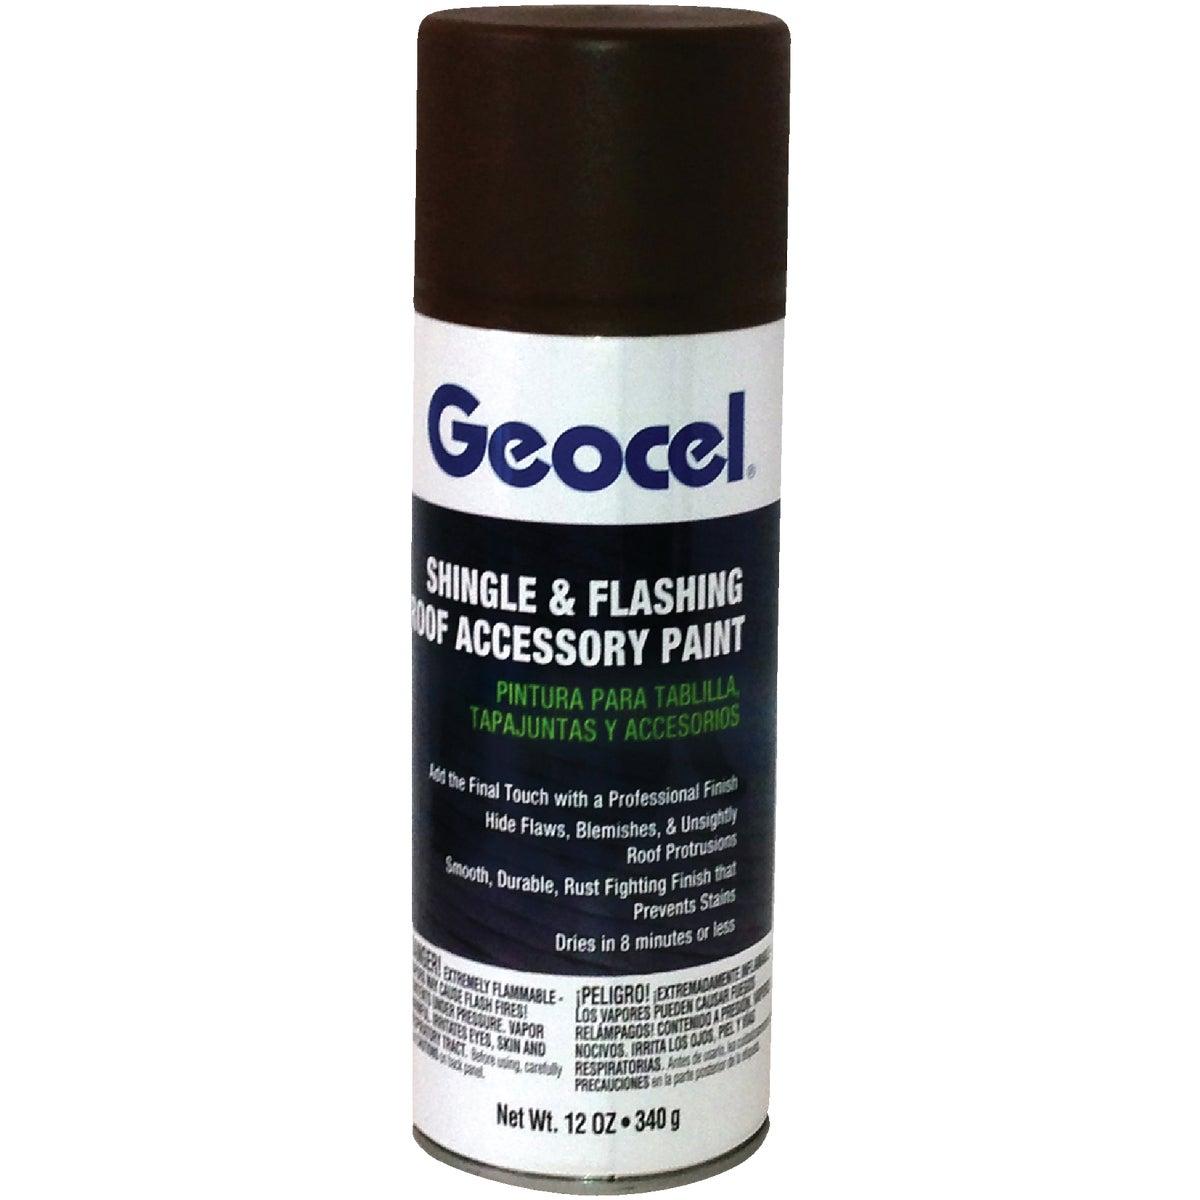 CHARCOAL ROOF PAINT - GC91132 by Geocel Llc